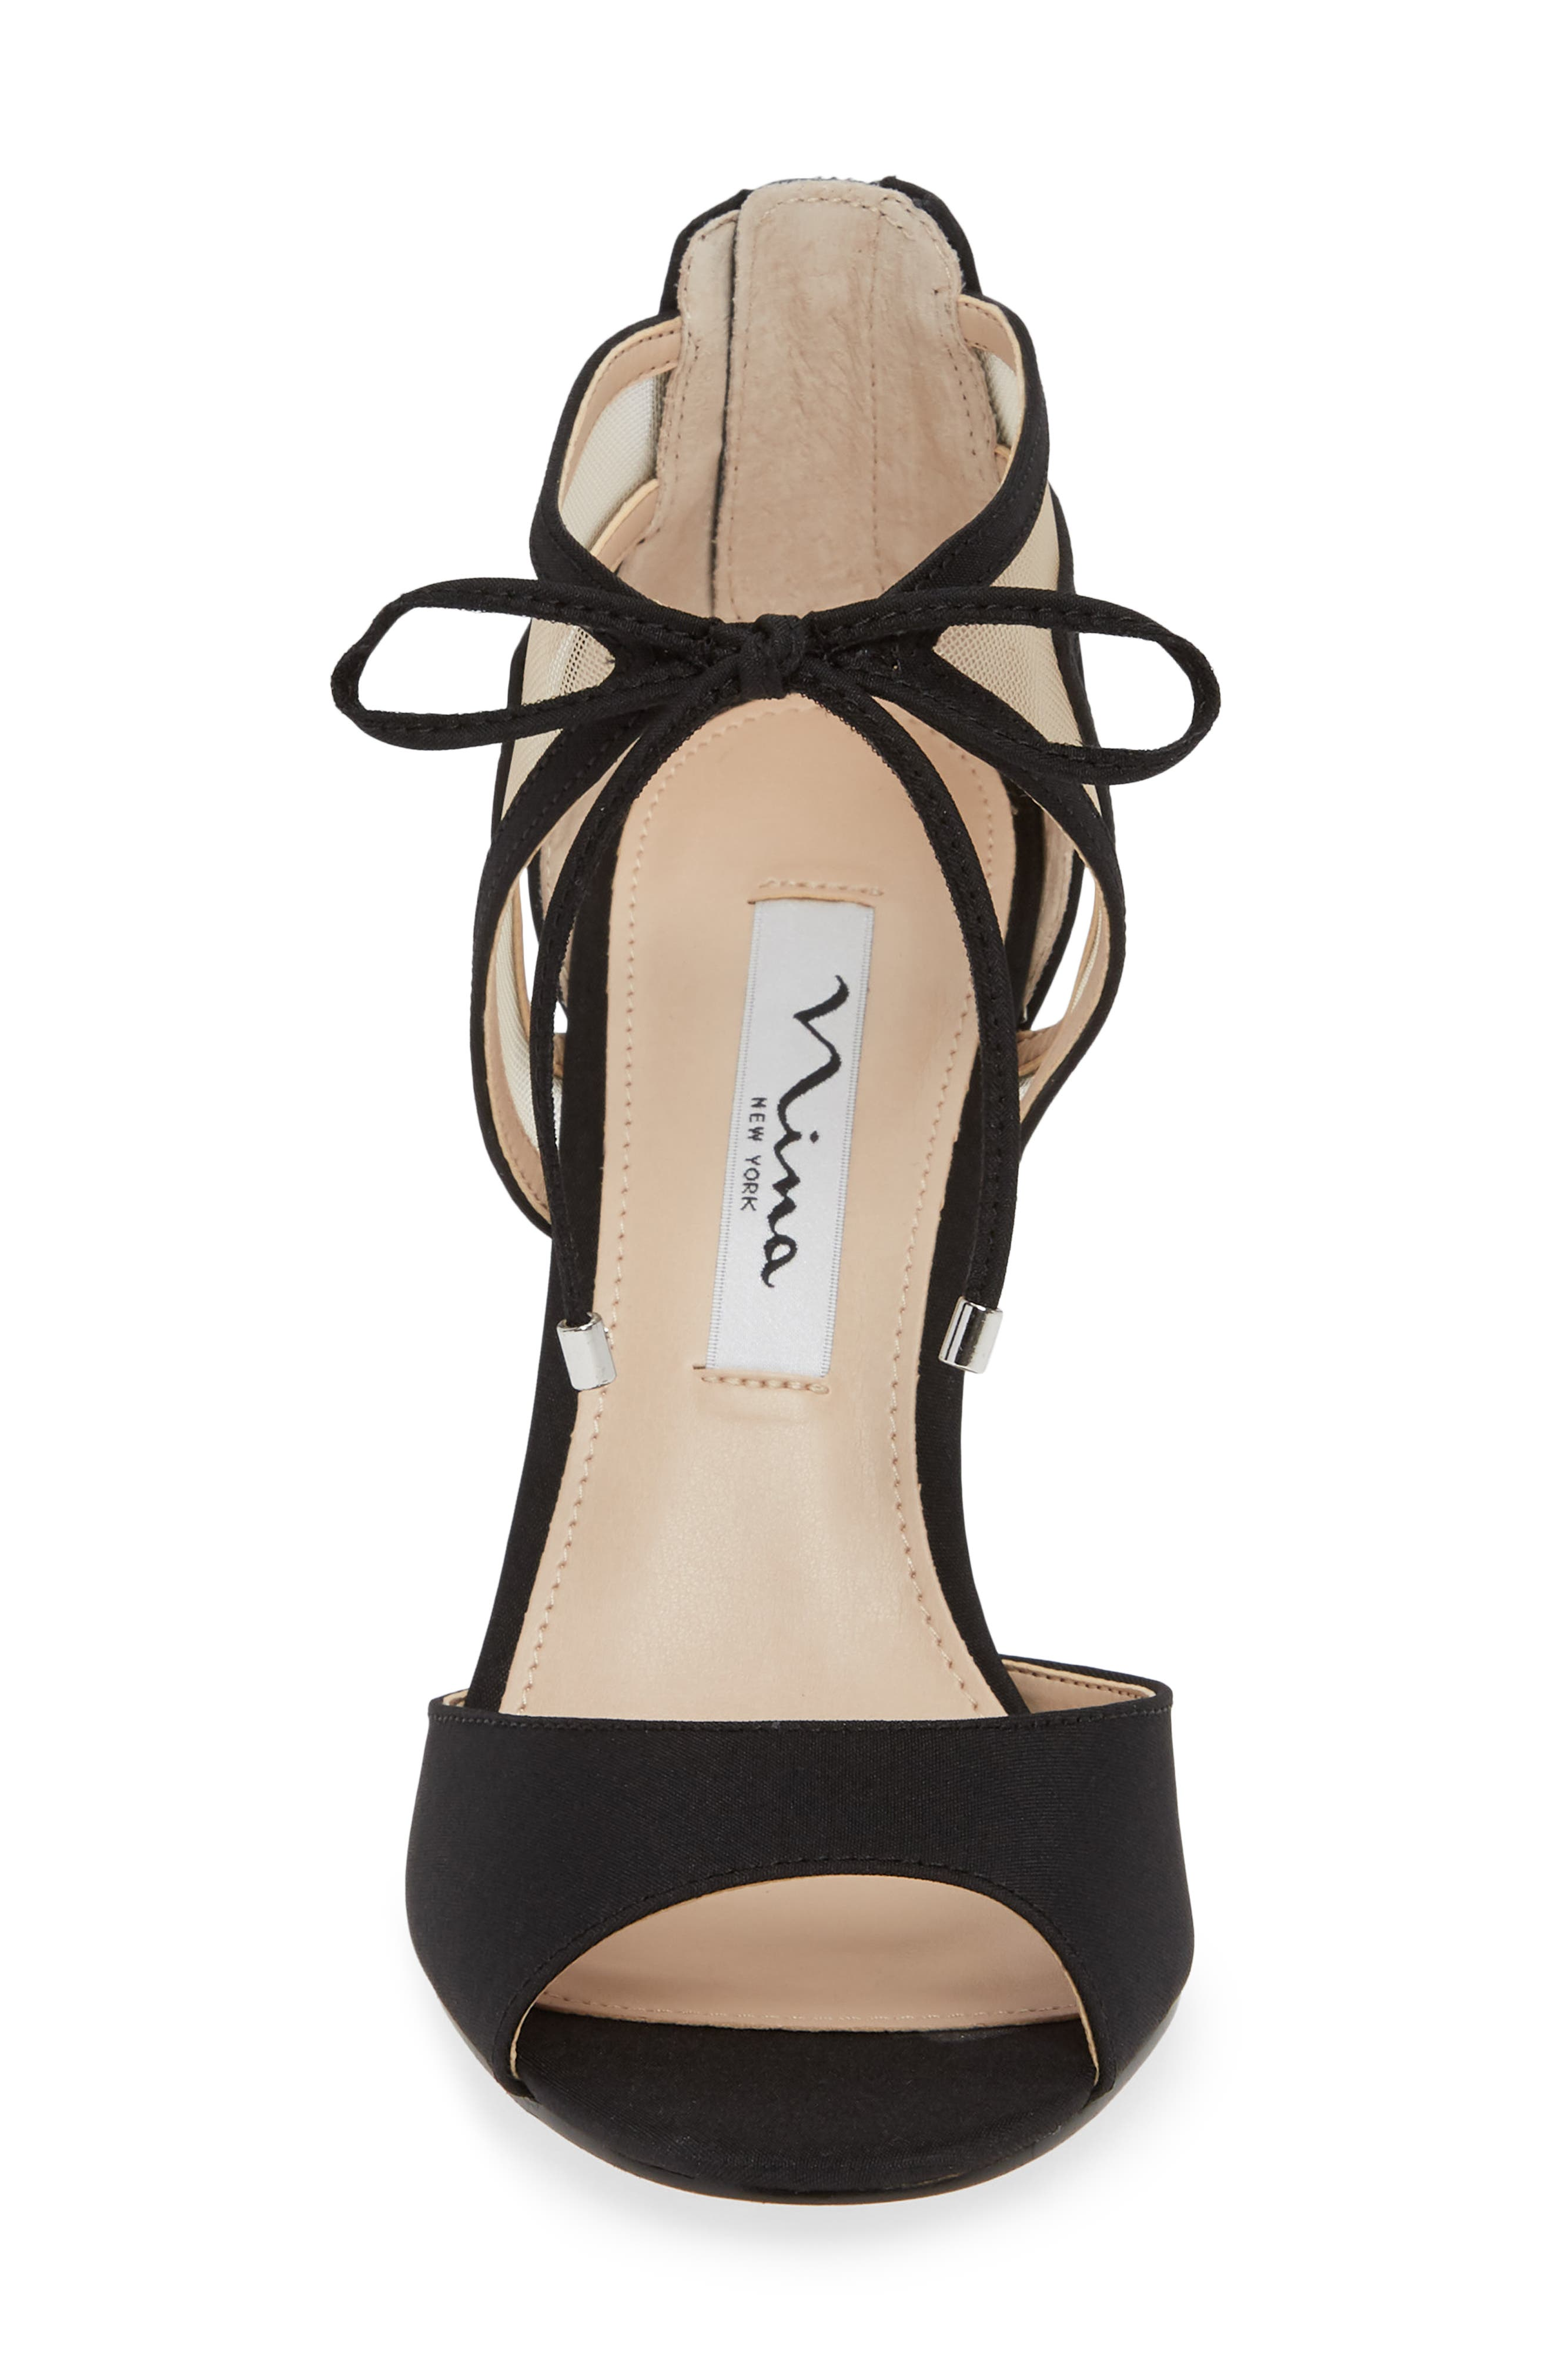 NINA, Caleya Ankle Tie Sandal, Alternate thumbnail 4, color, BLACK CHAMPAGNE